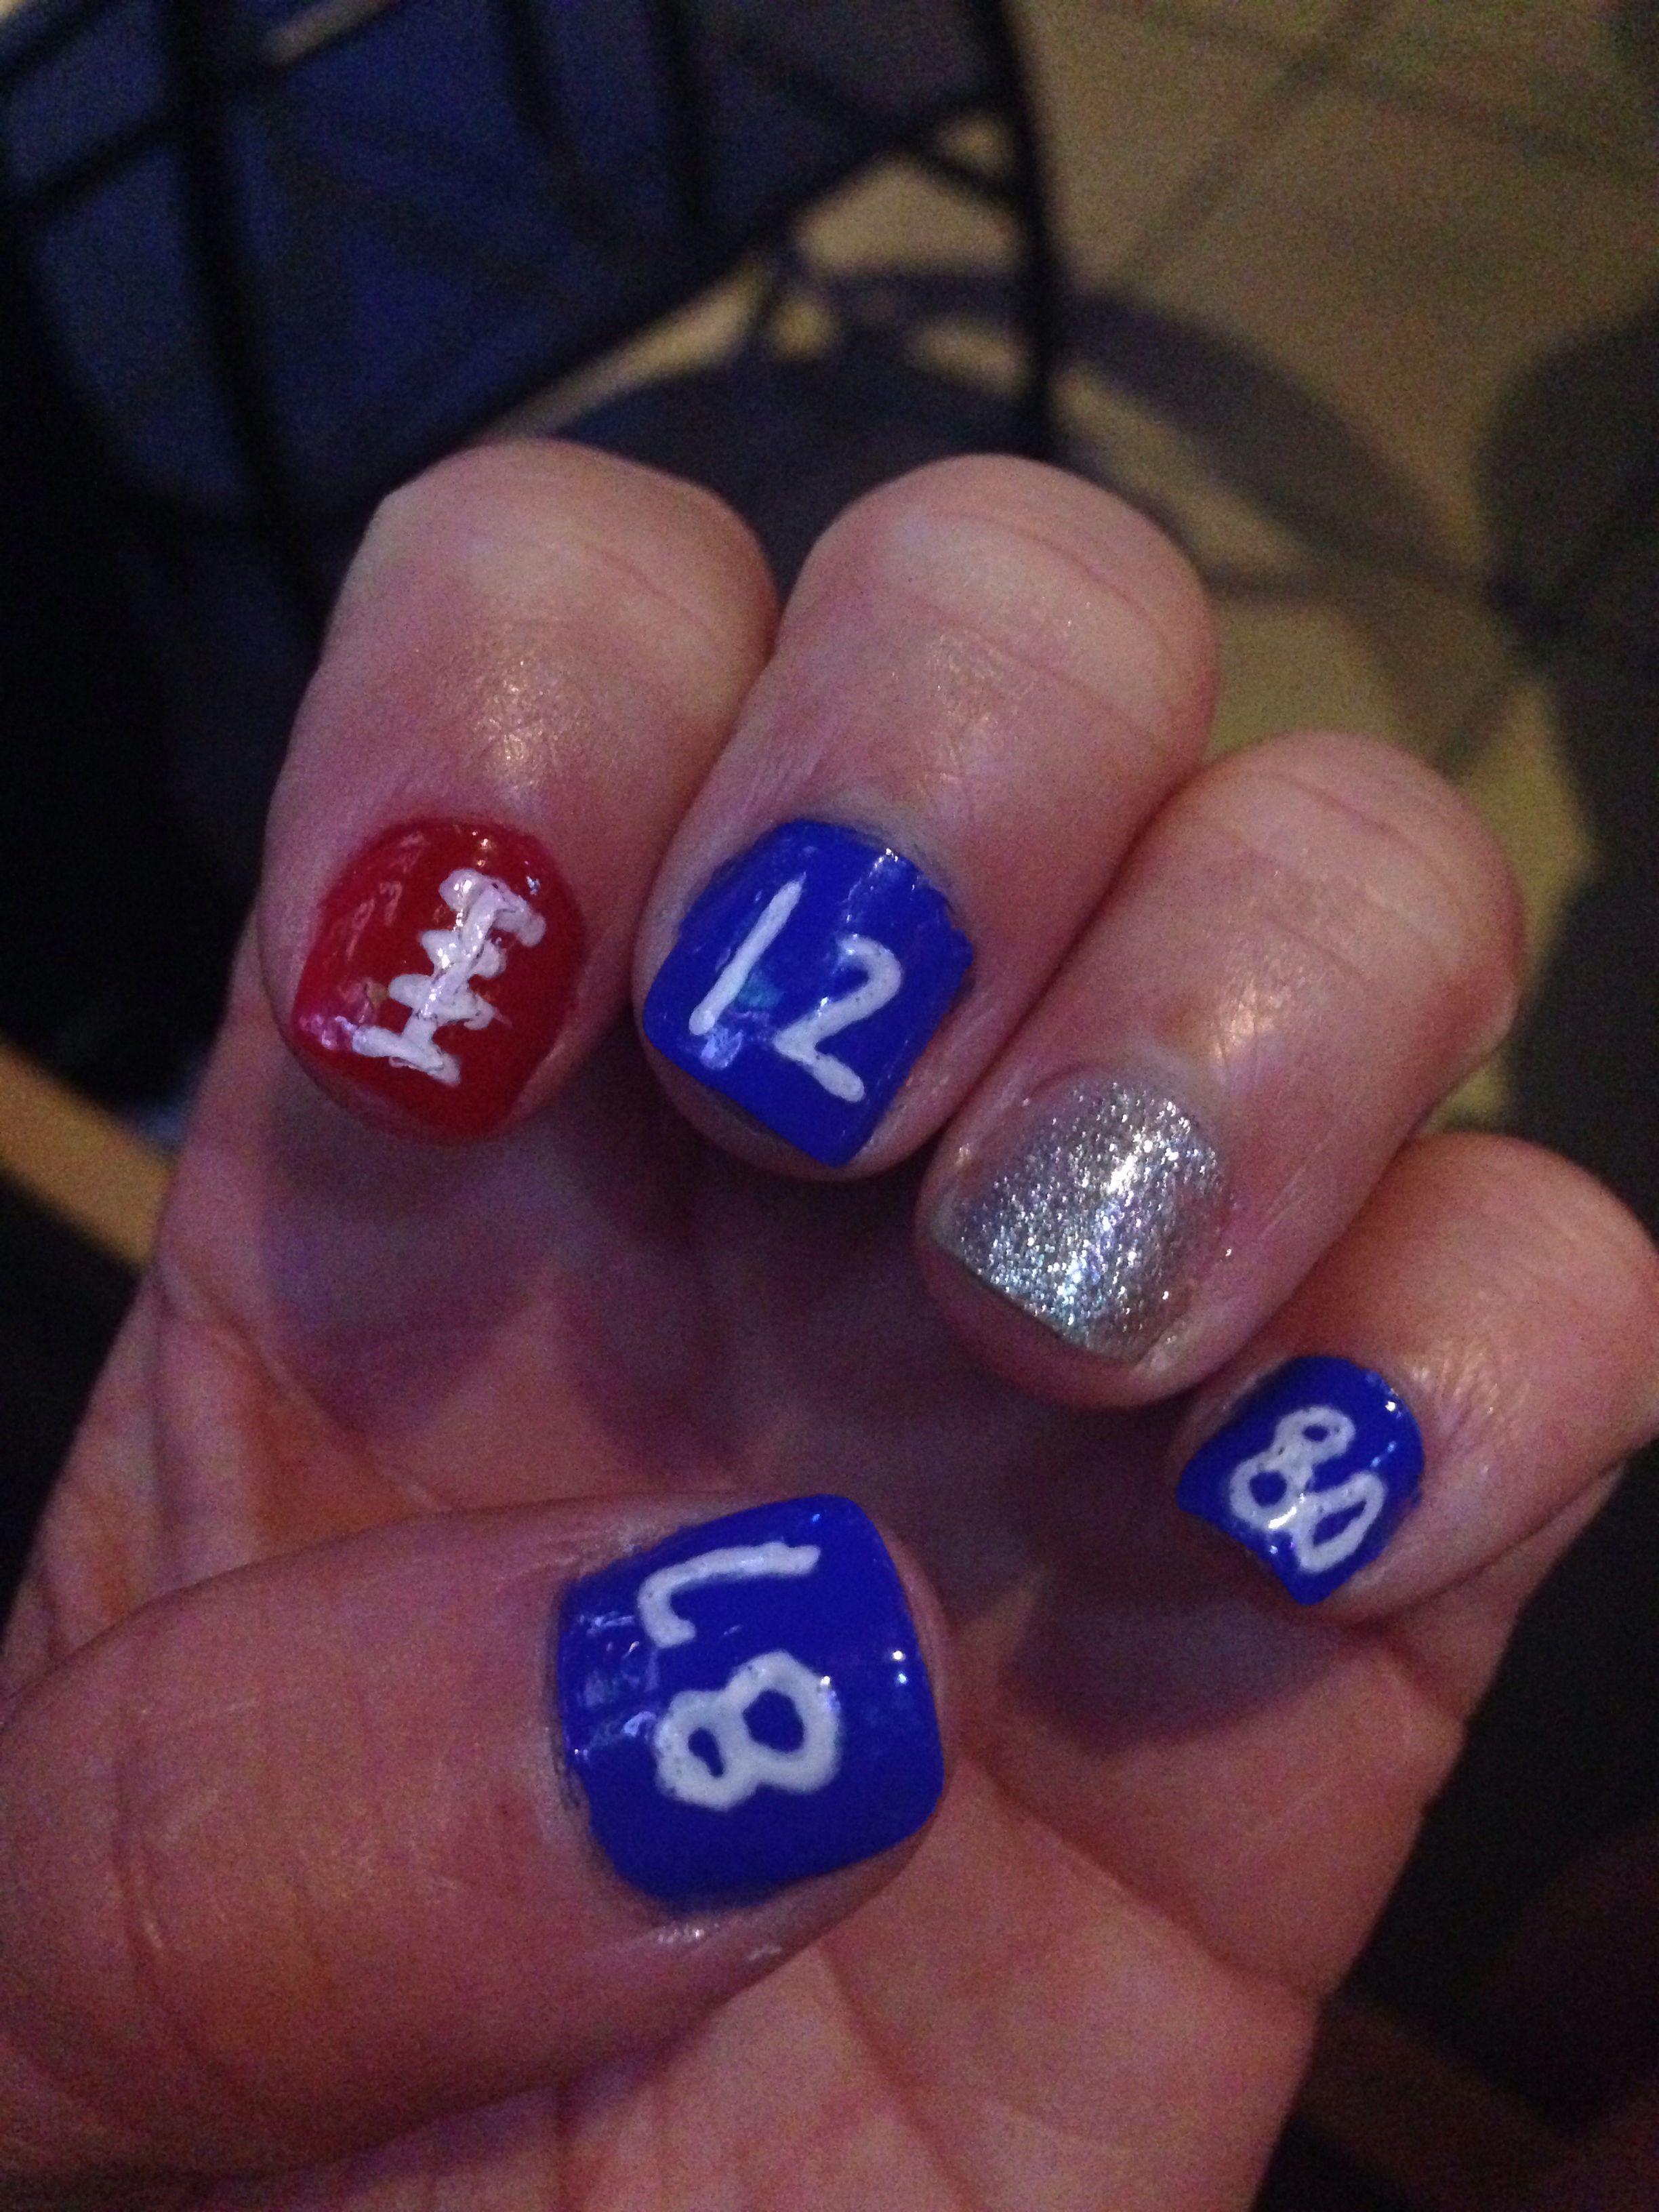 New England patriots nail art   Nail art   Pinterest